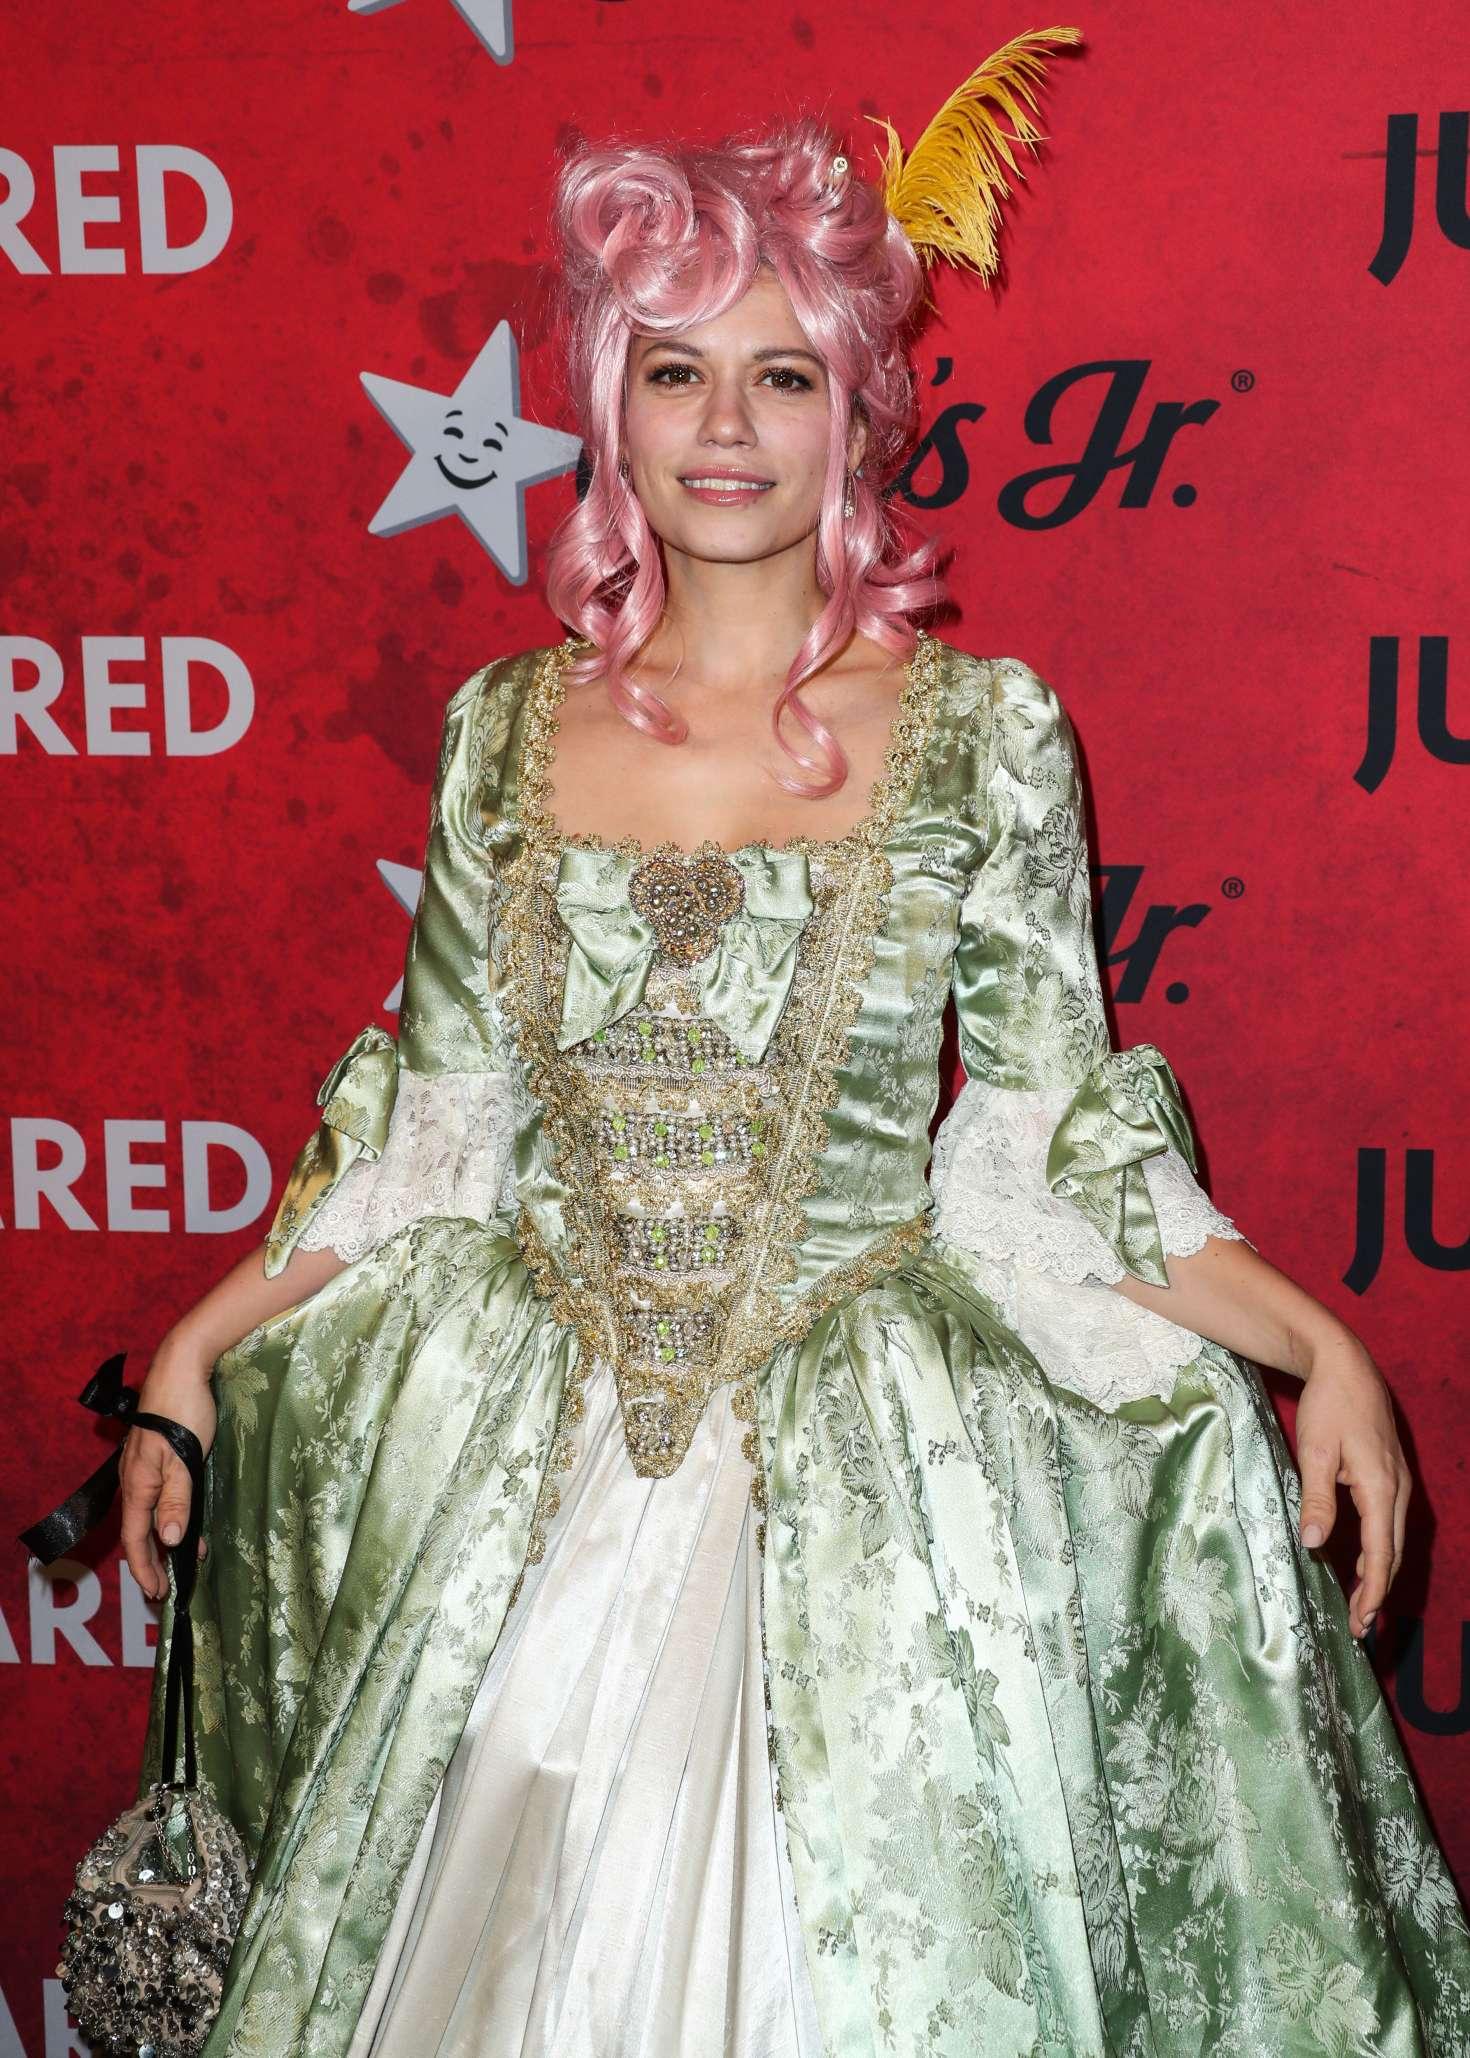 Bethany Joy Lenz 2018 : Bethany Joy Lenz: Just Jareds 7th Annual Halloween Party -09